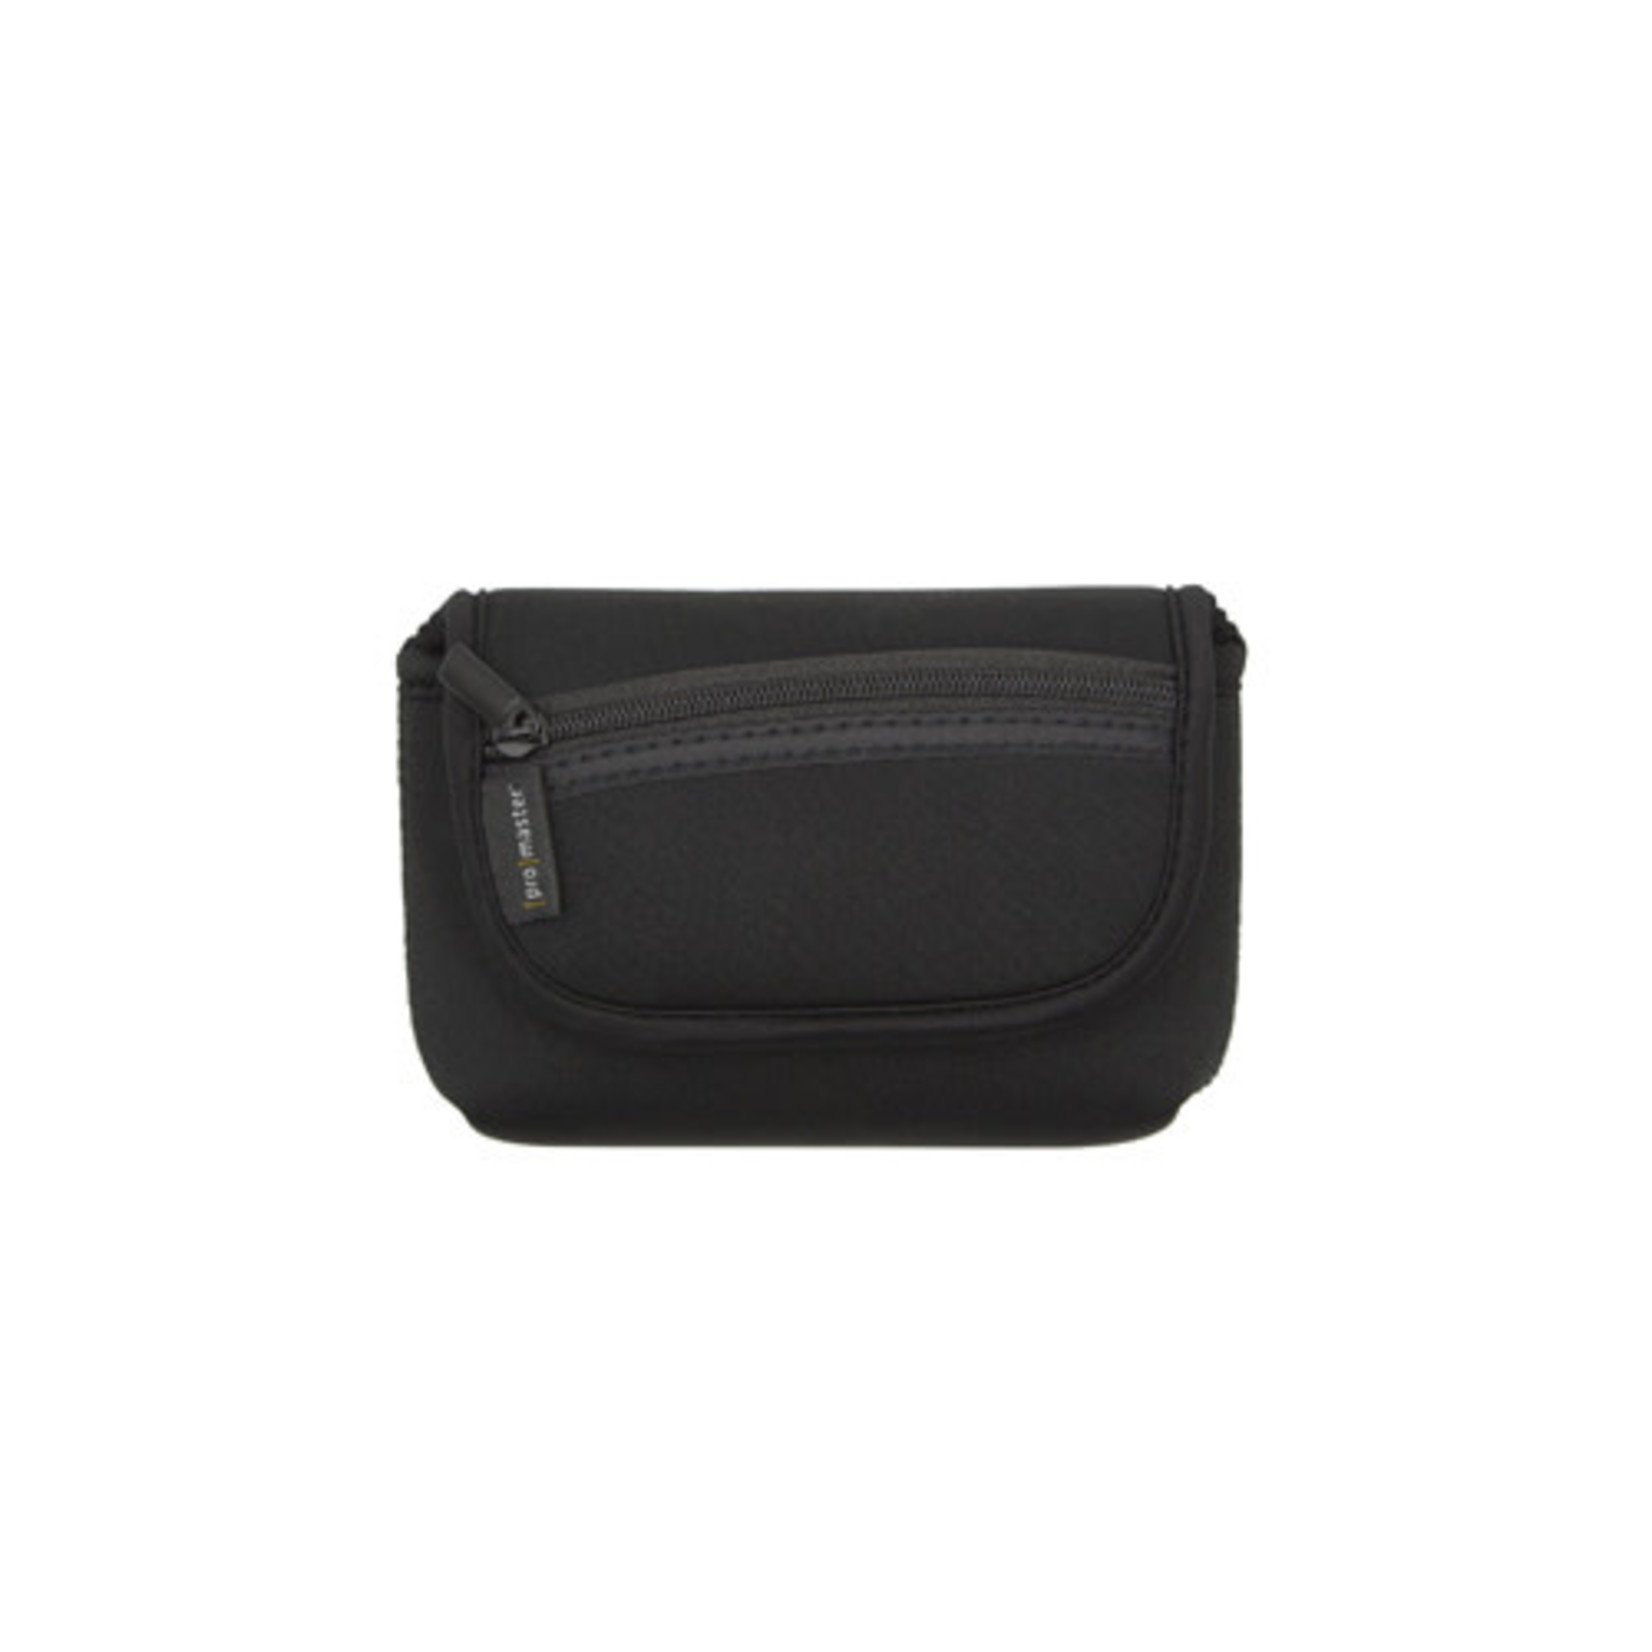 ProMaster Neoprene Compact Camera Pouch - Medium